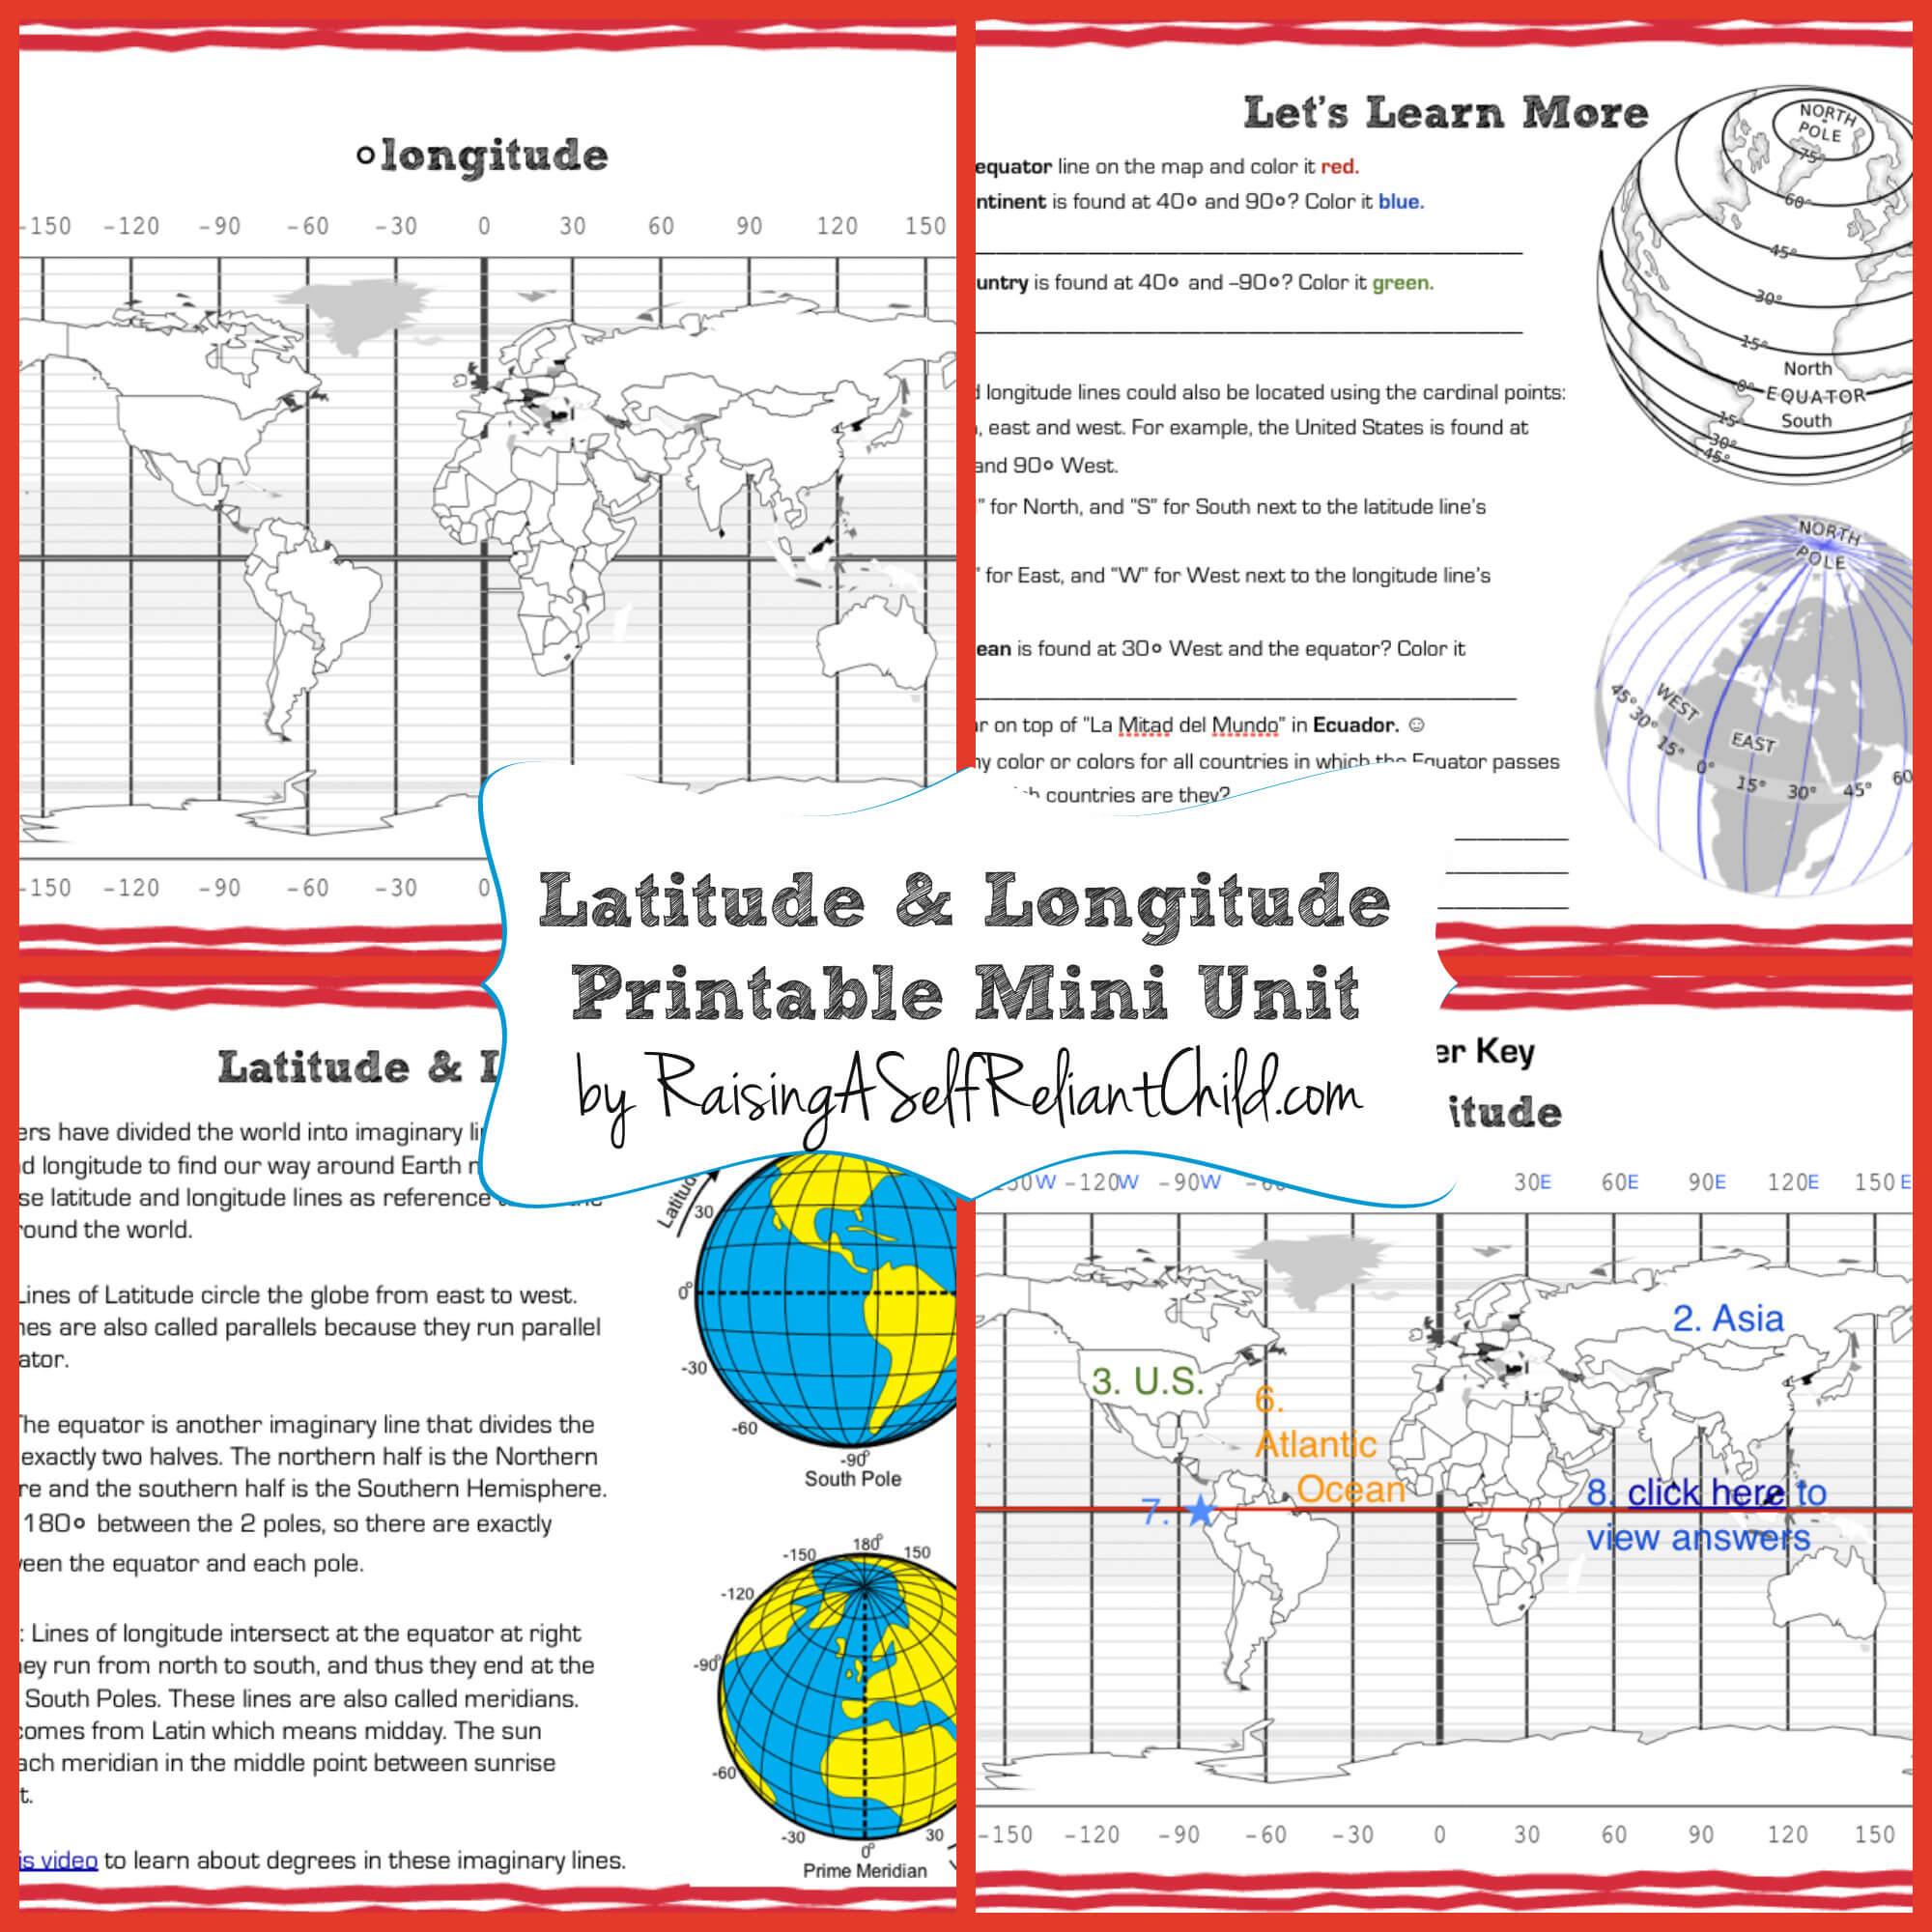 Worksheets Longitude And Latitude Worksheet free printable mini unit latitude and longitude for kids